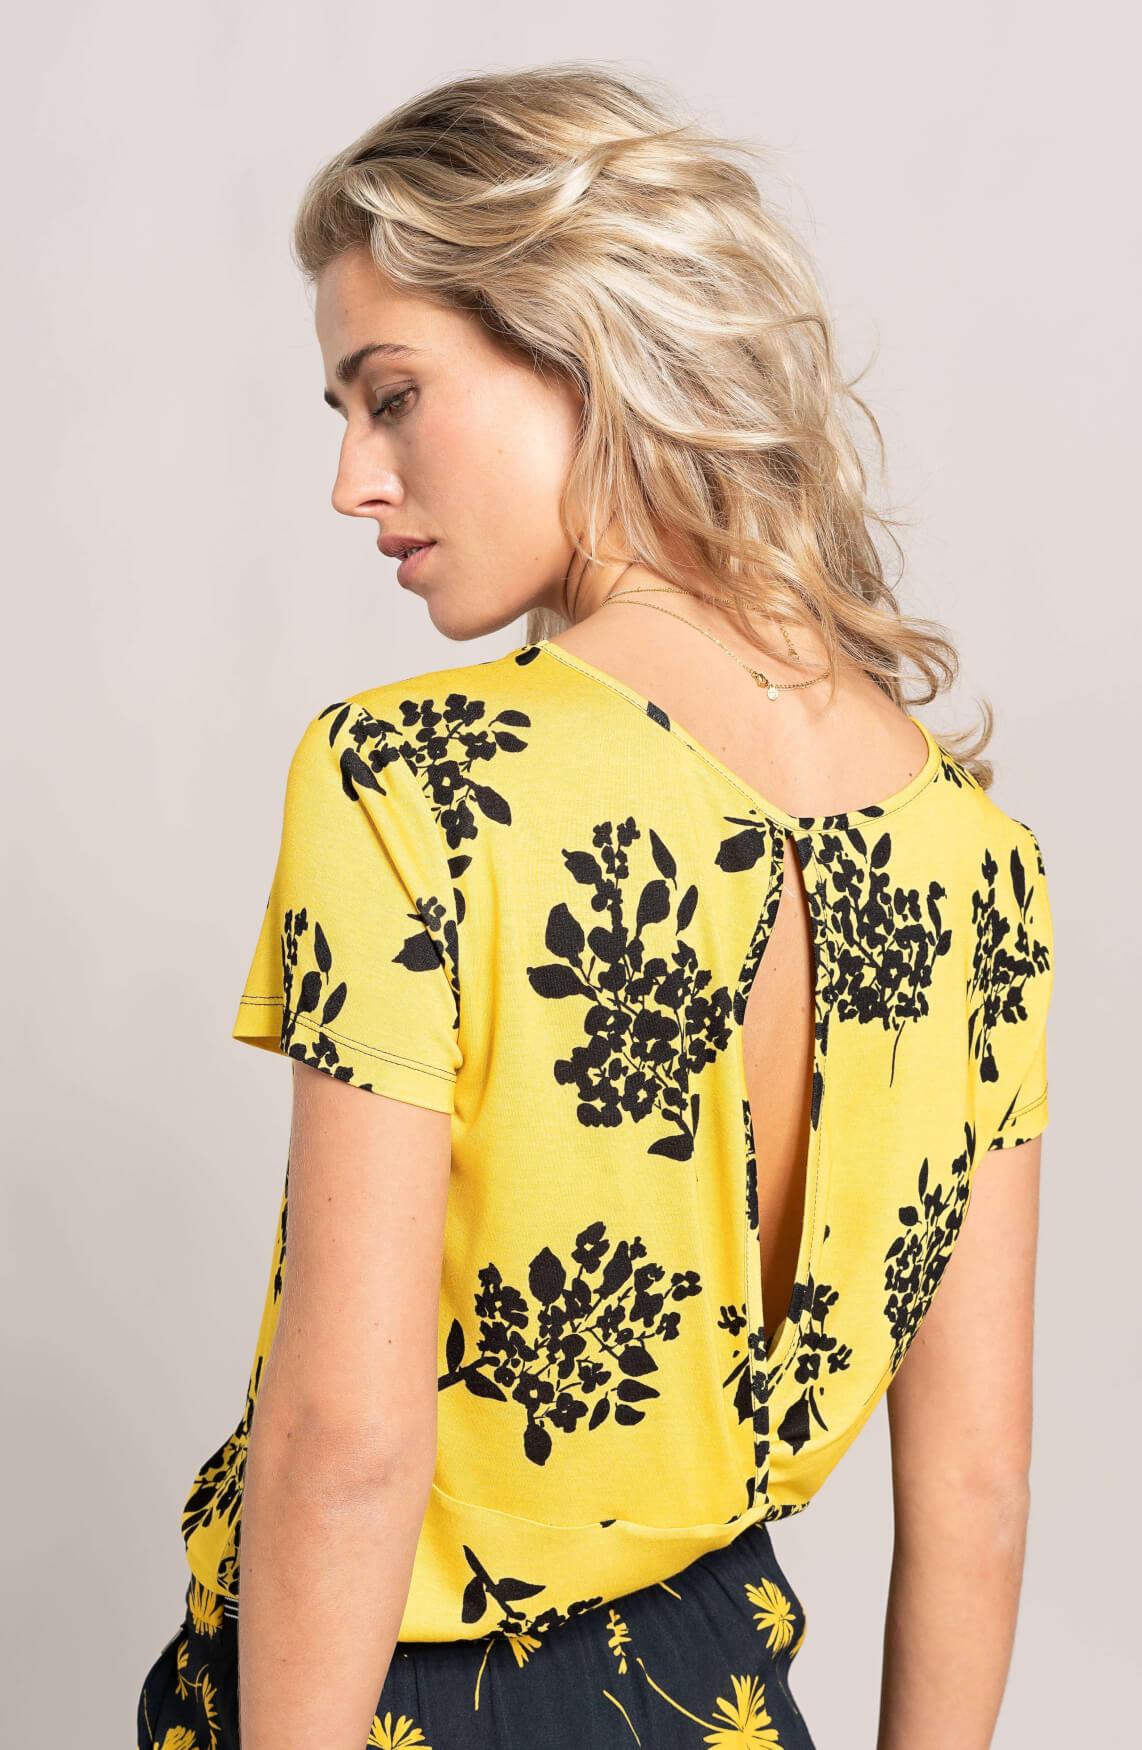 Anna Dames Shirt met floral print geel